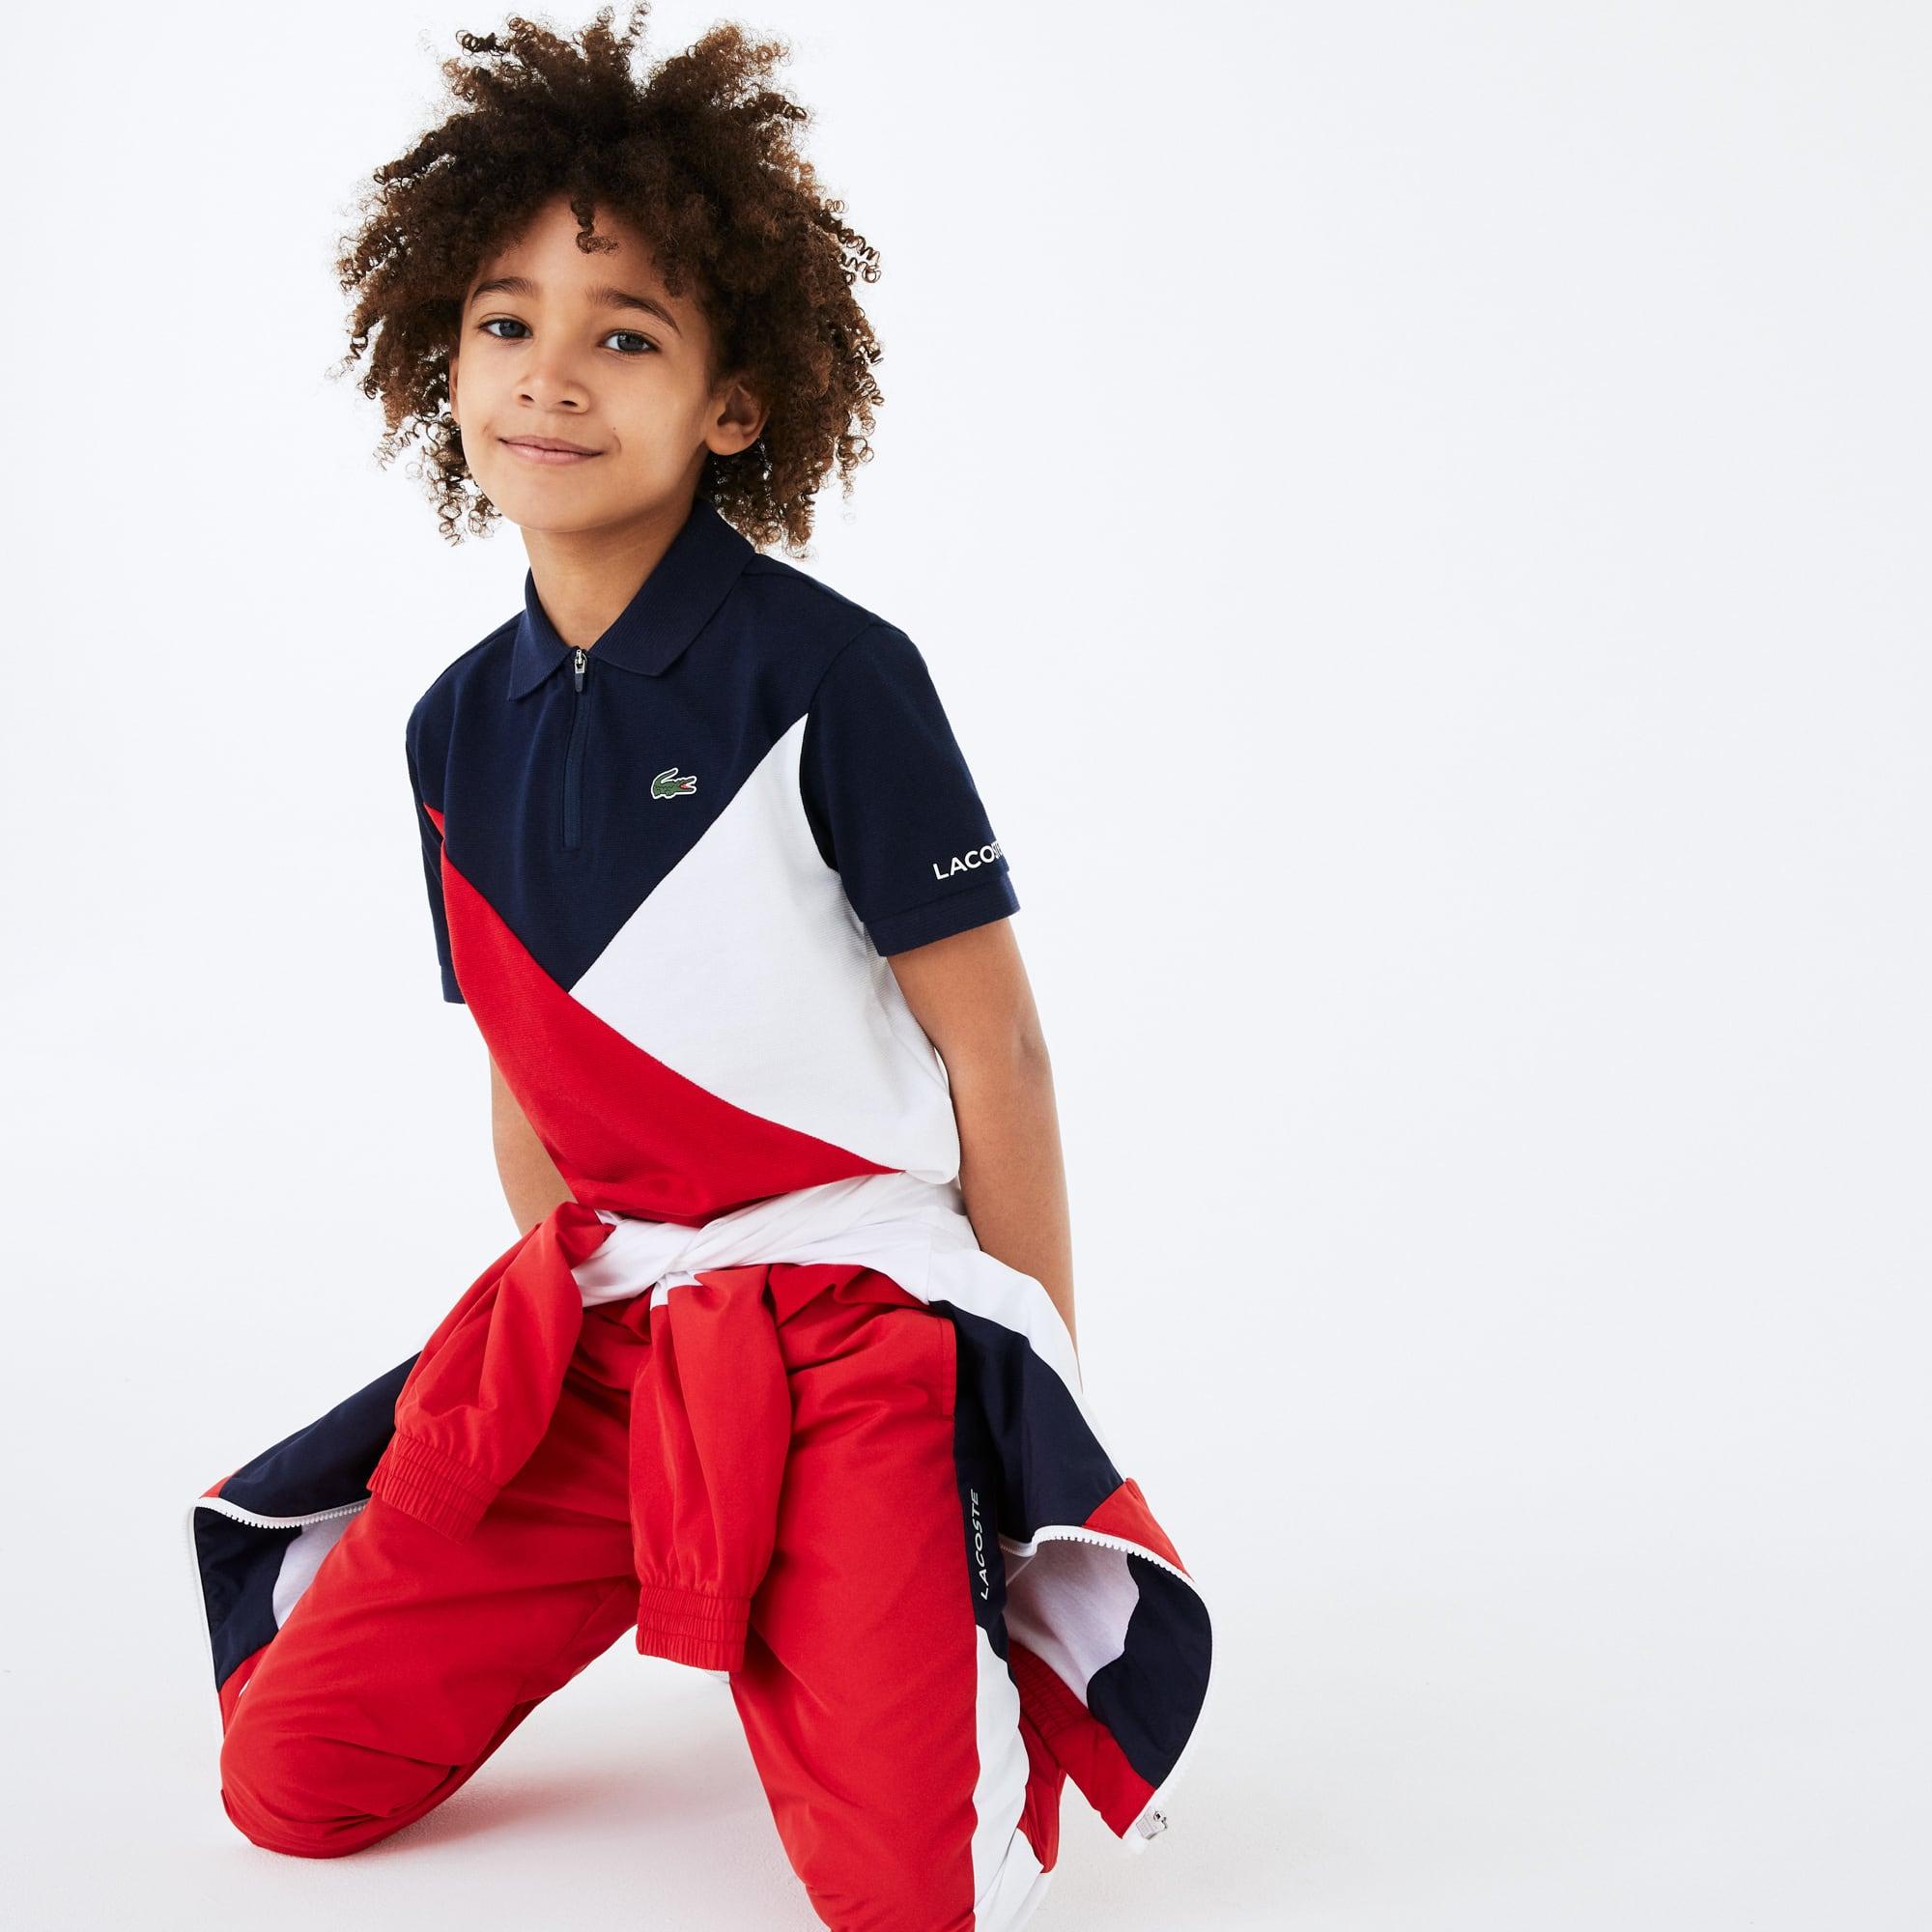 Boys 라코스테 Lacoste SPORT Colourblock Ultra-Light Knit Polo Shirt